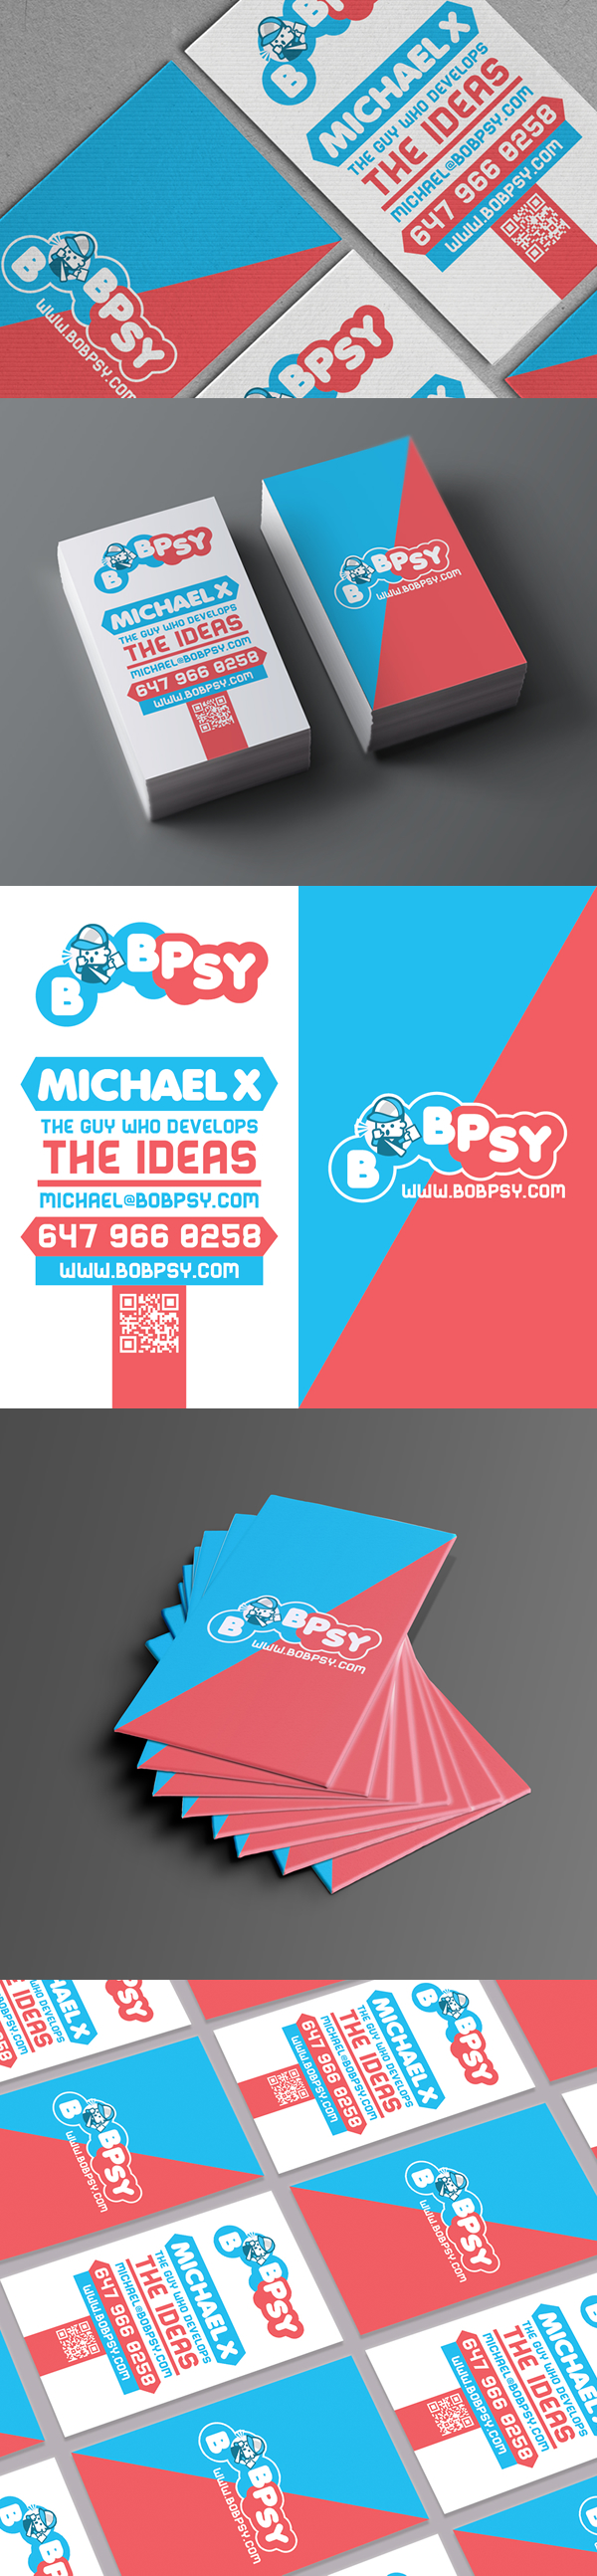 Bobpsy business card